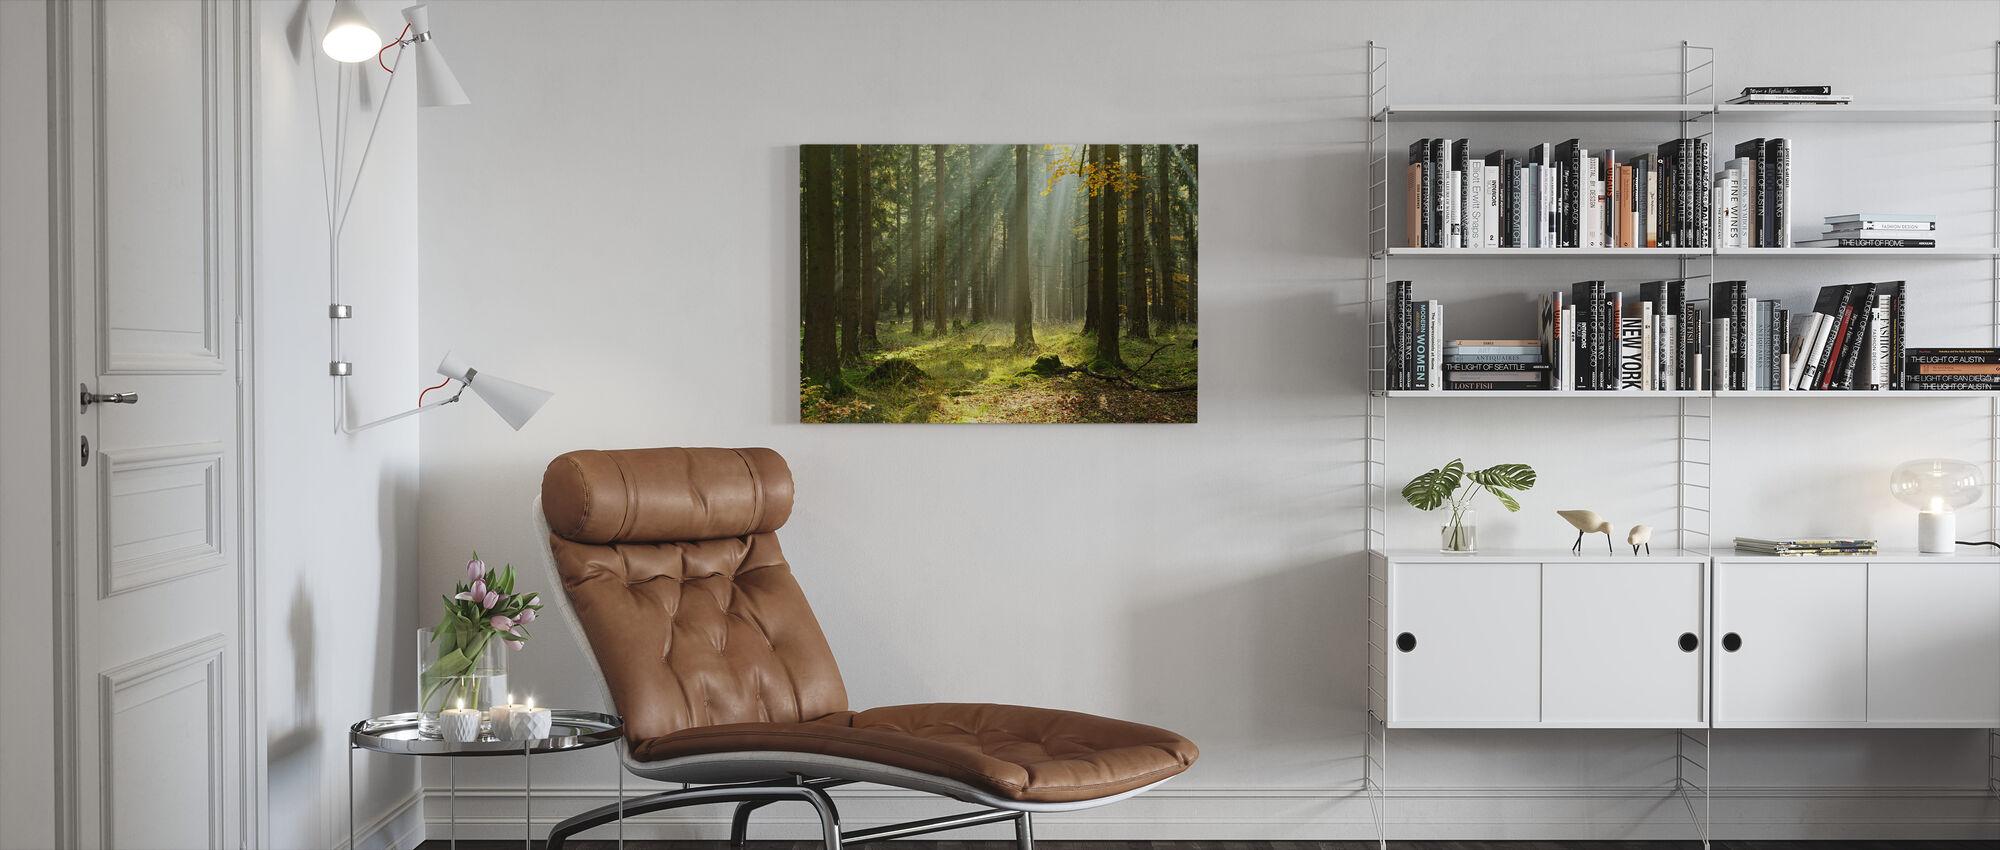 Eterisk skog - Canvastavla - Vardagsrum